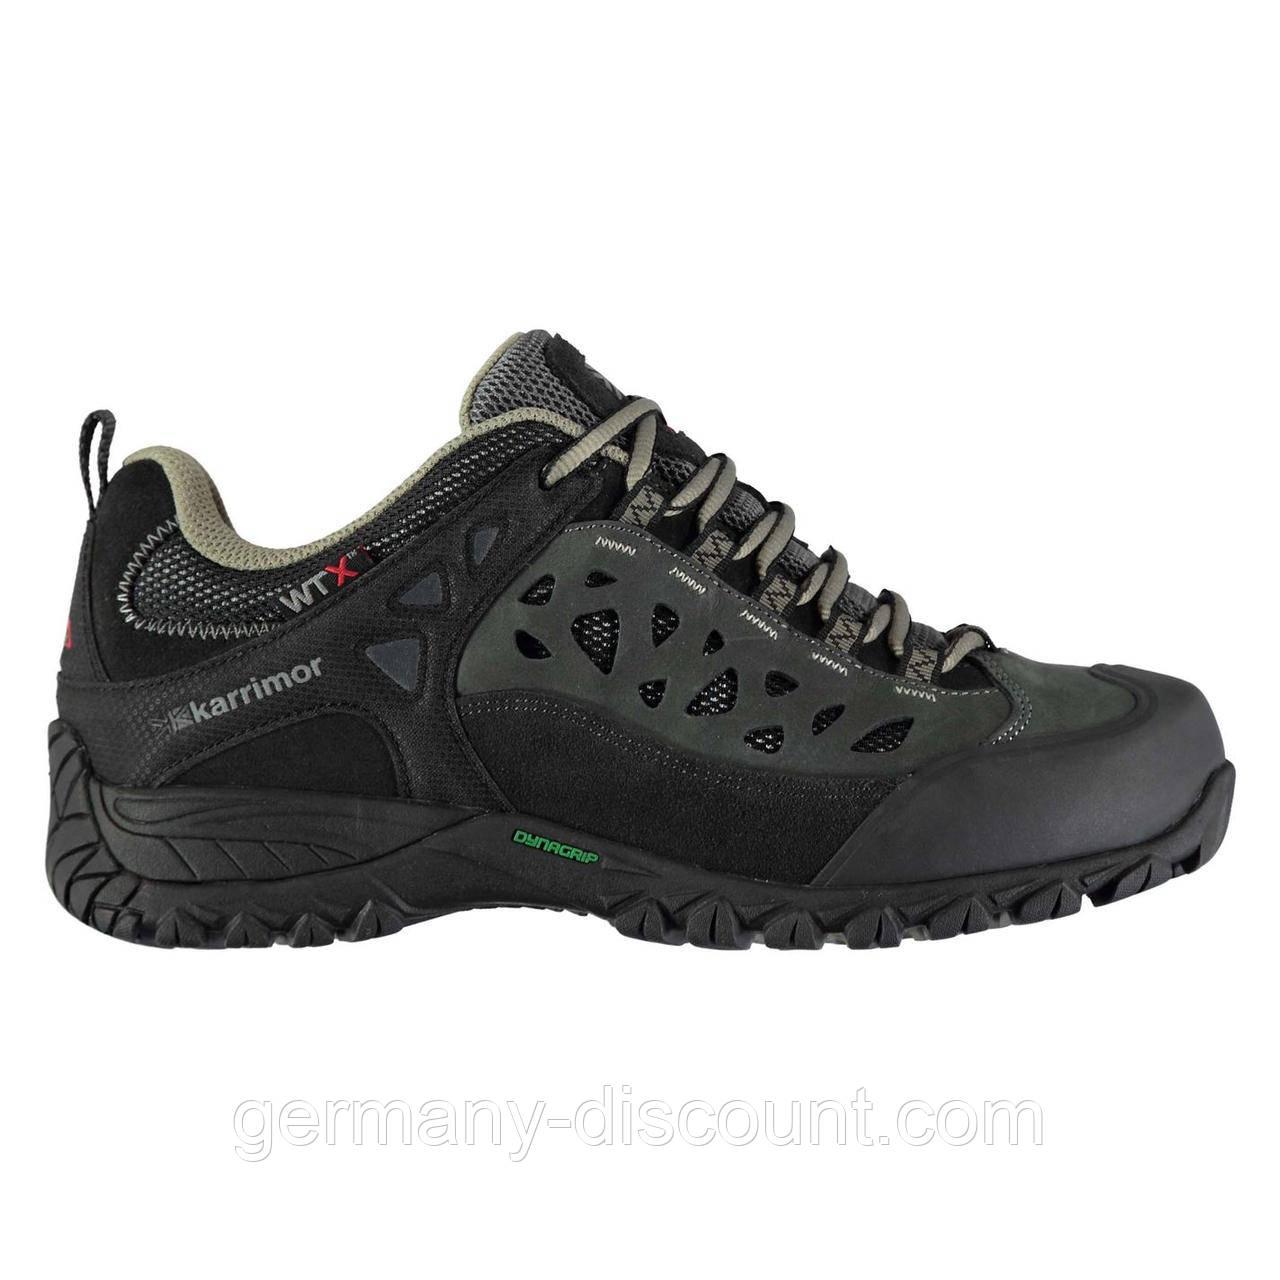 Треккинговые ботинки Karrimor Corrie WTX Mens Walking Shoes